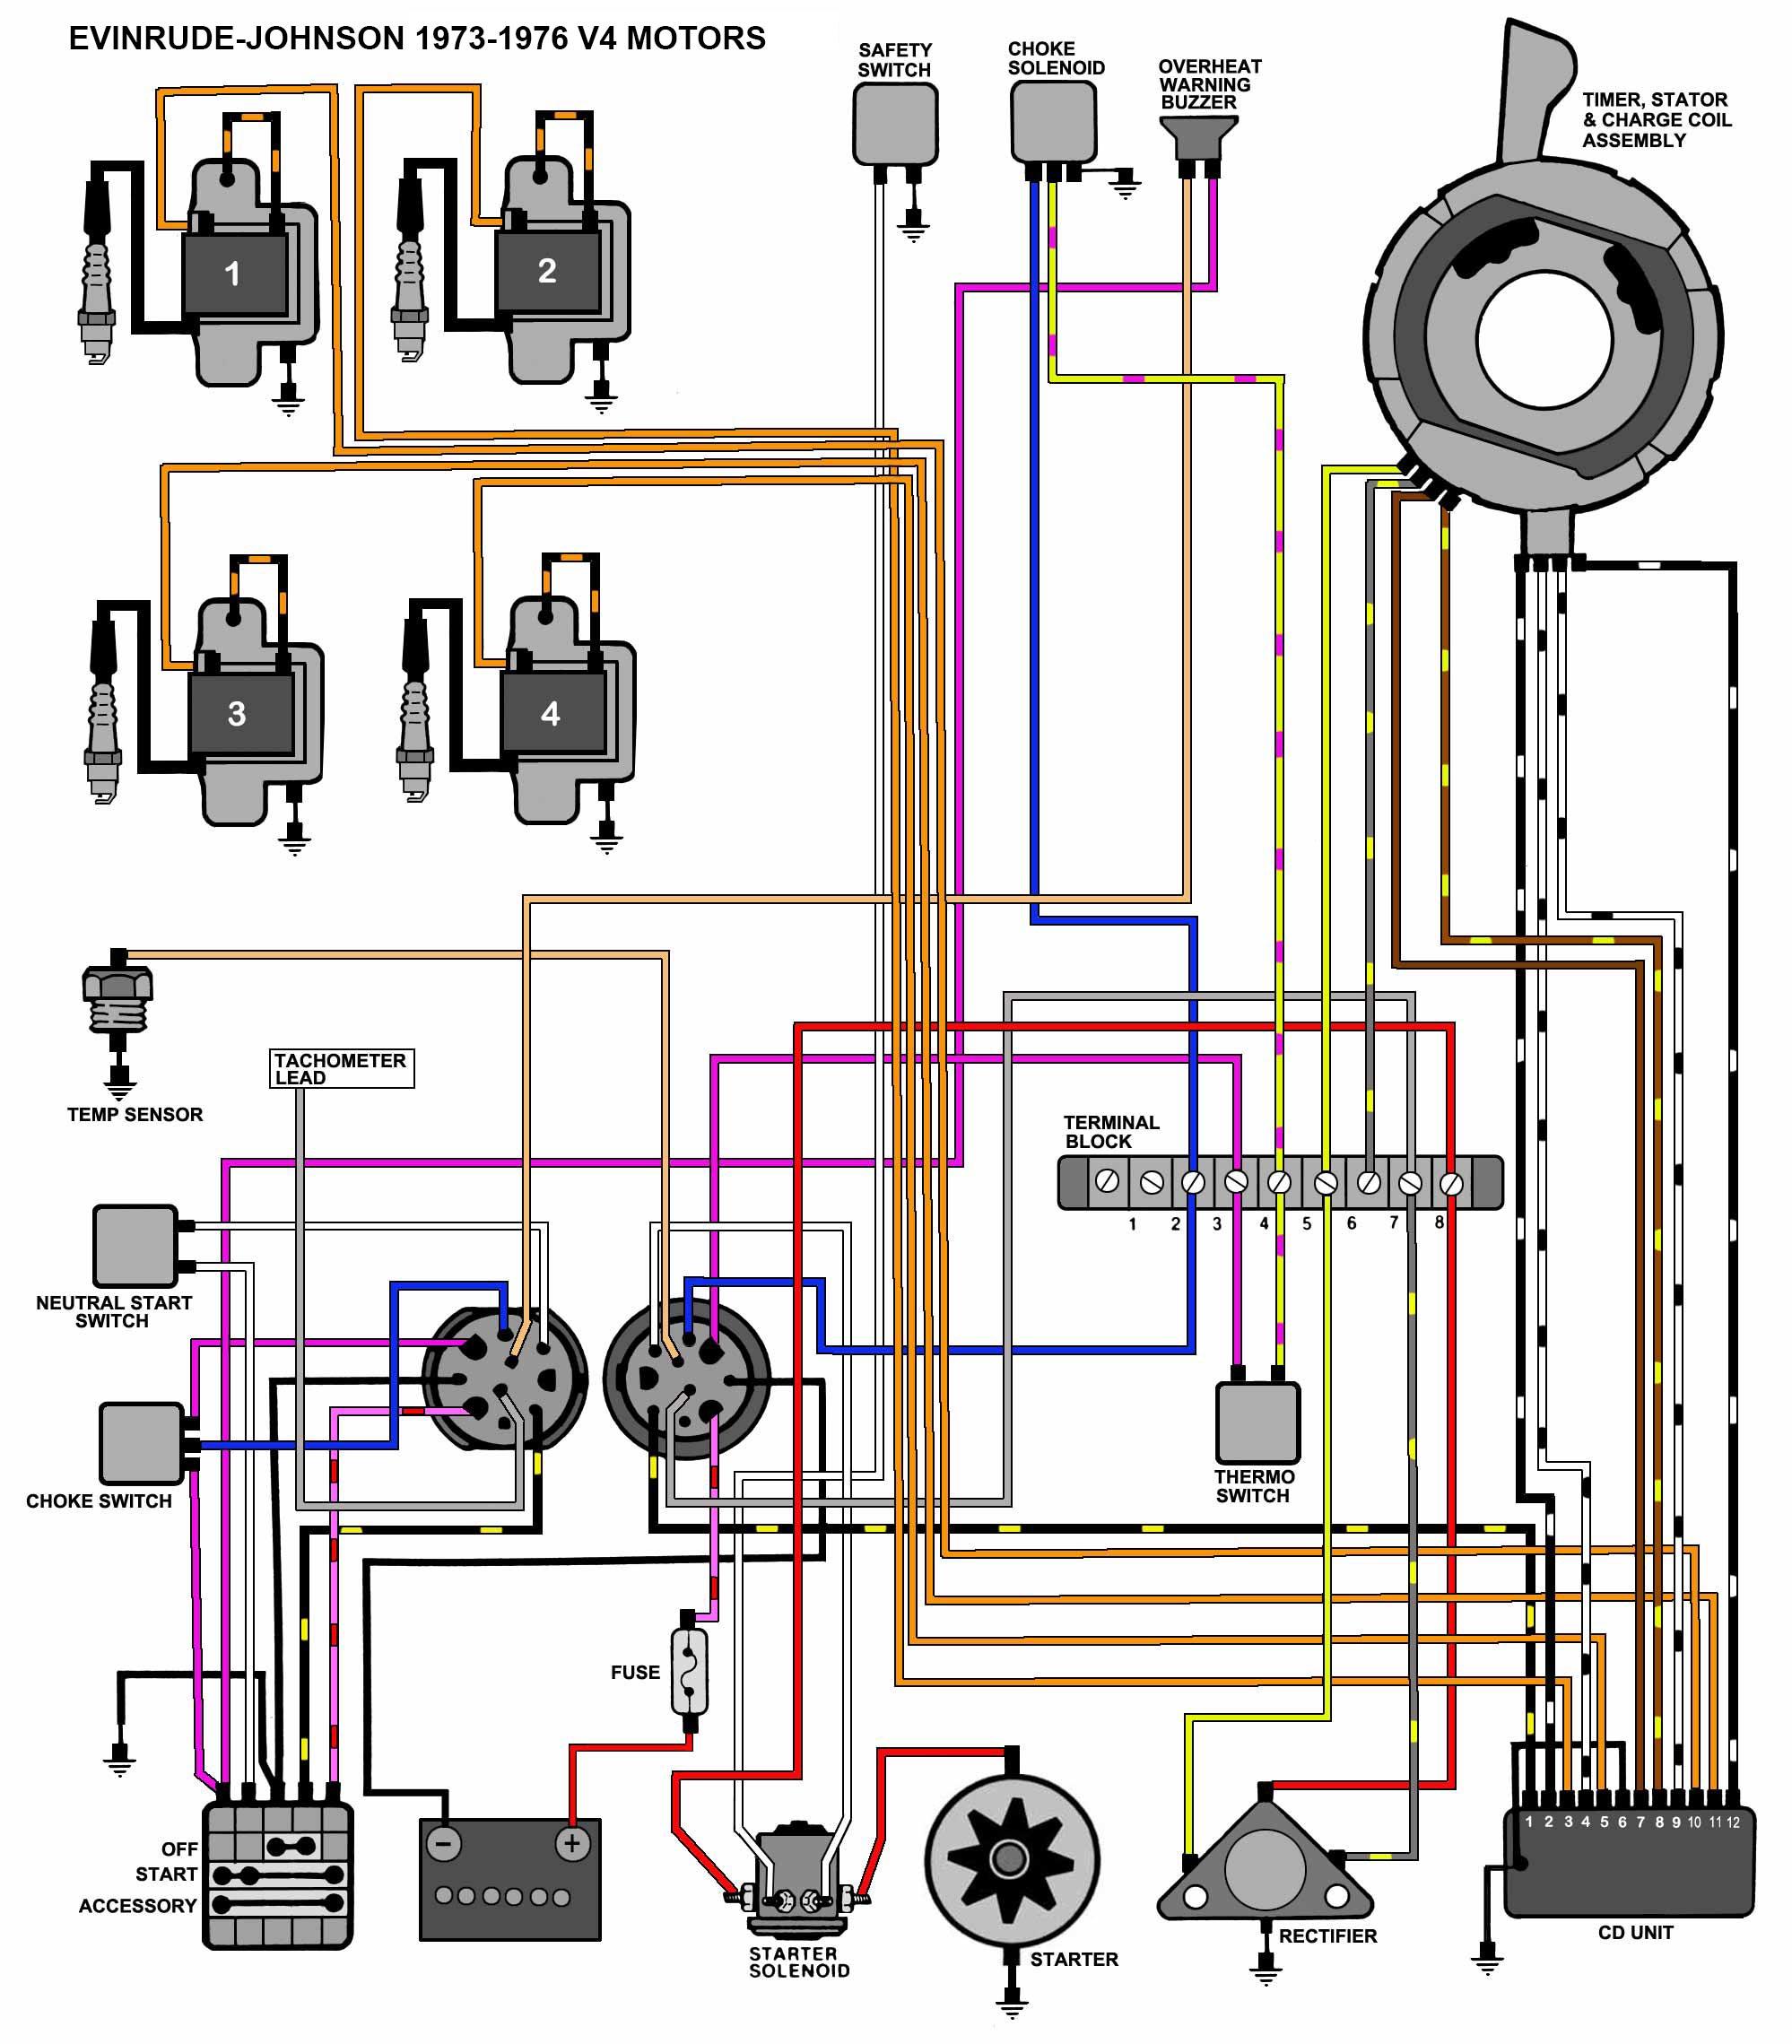 1971 evinrude 50 hp wiring diagram 34 wiring diagram Evinrude Tachometer Wiring Diagram 1977 Evinrude Wiring Diagram